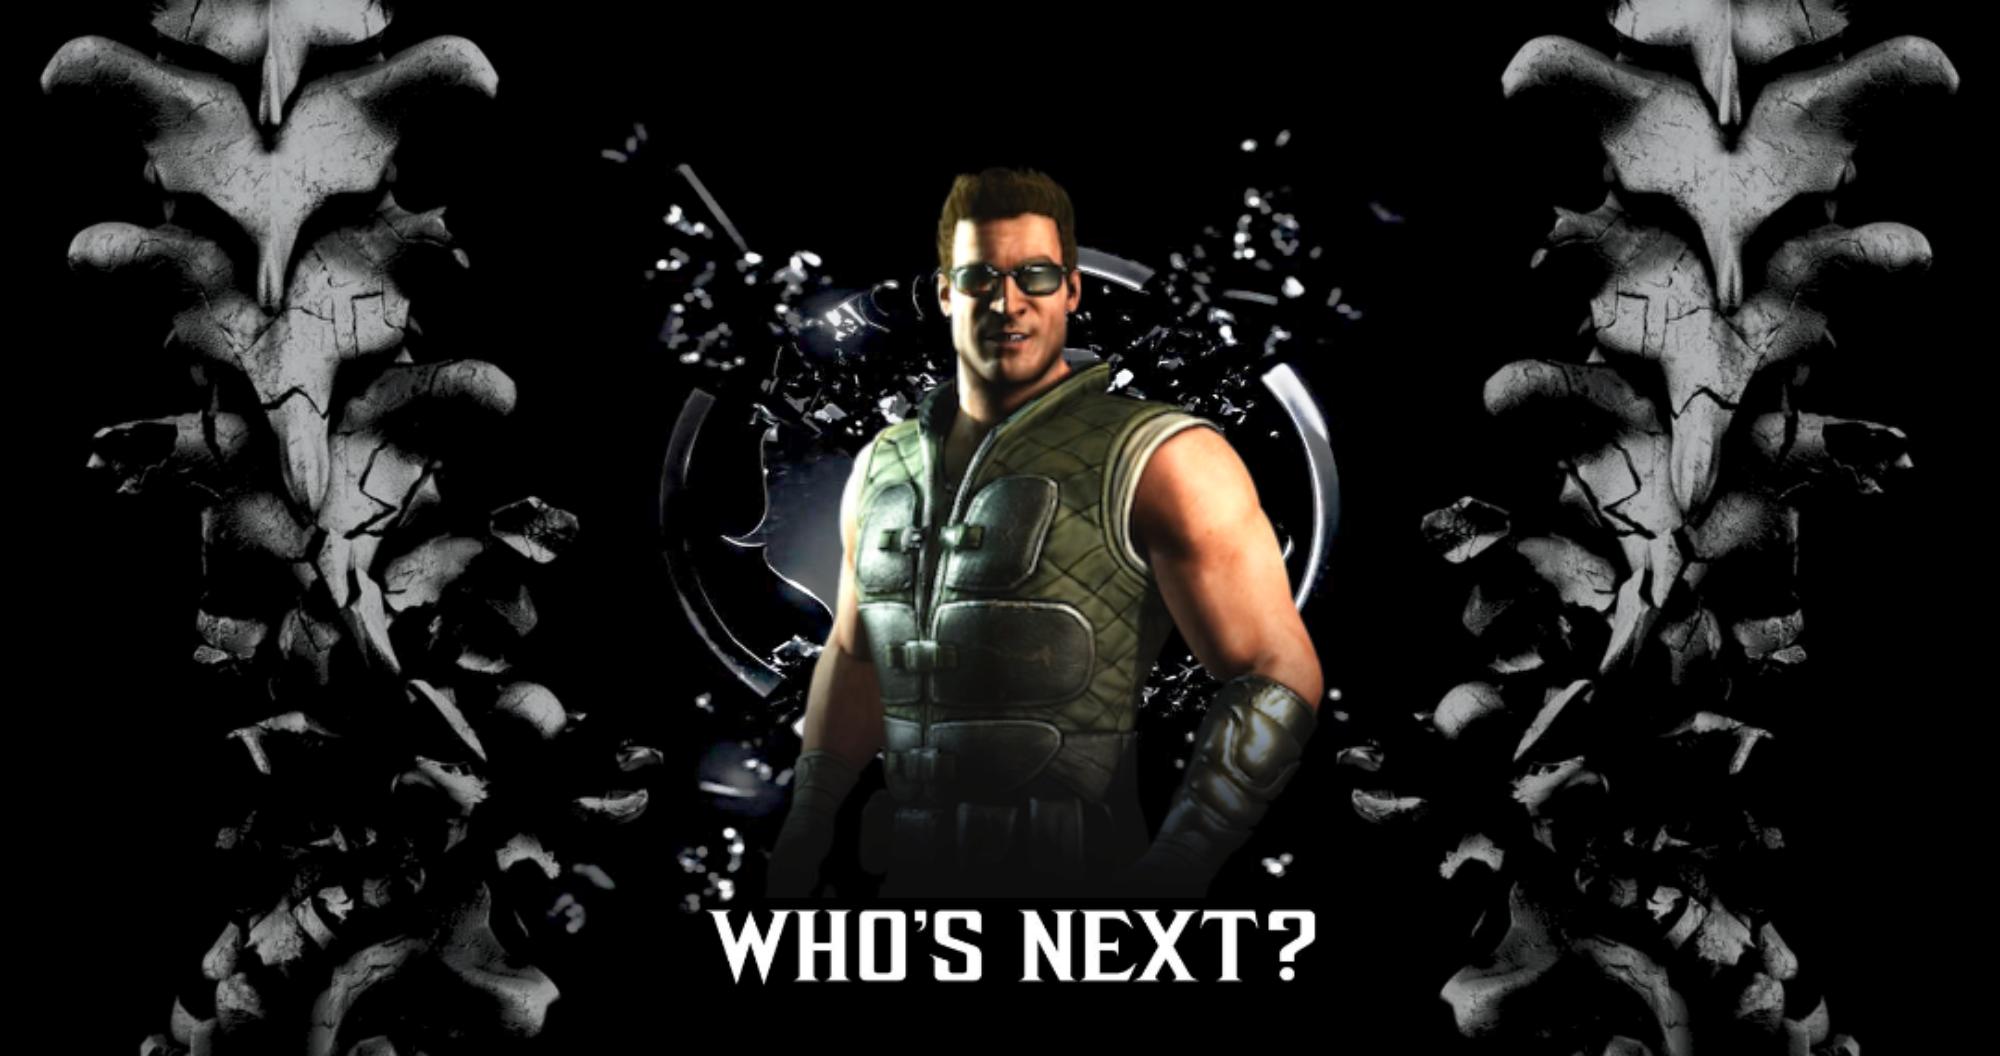 Mortal Kombat X Johnny Cage By Robertly3 On DeviantArt